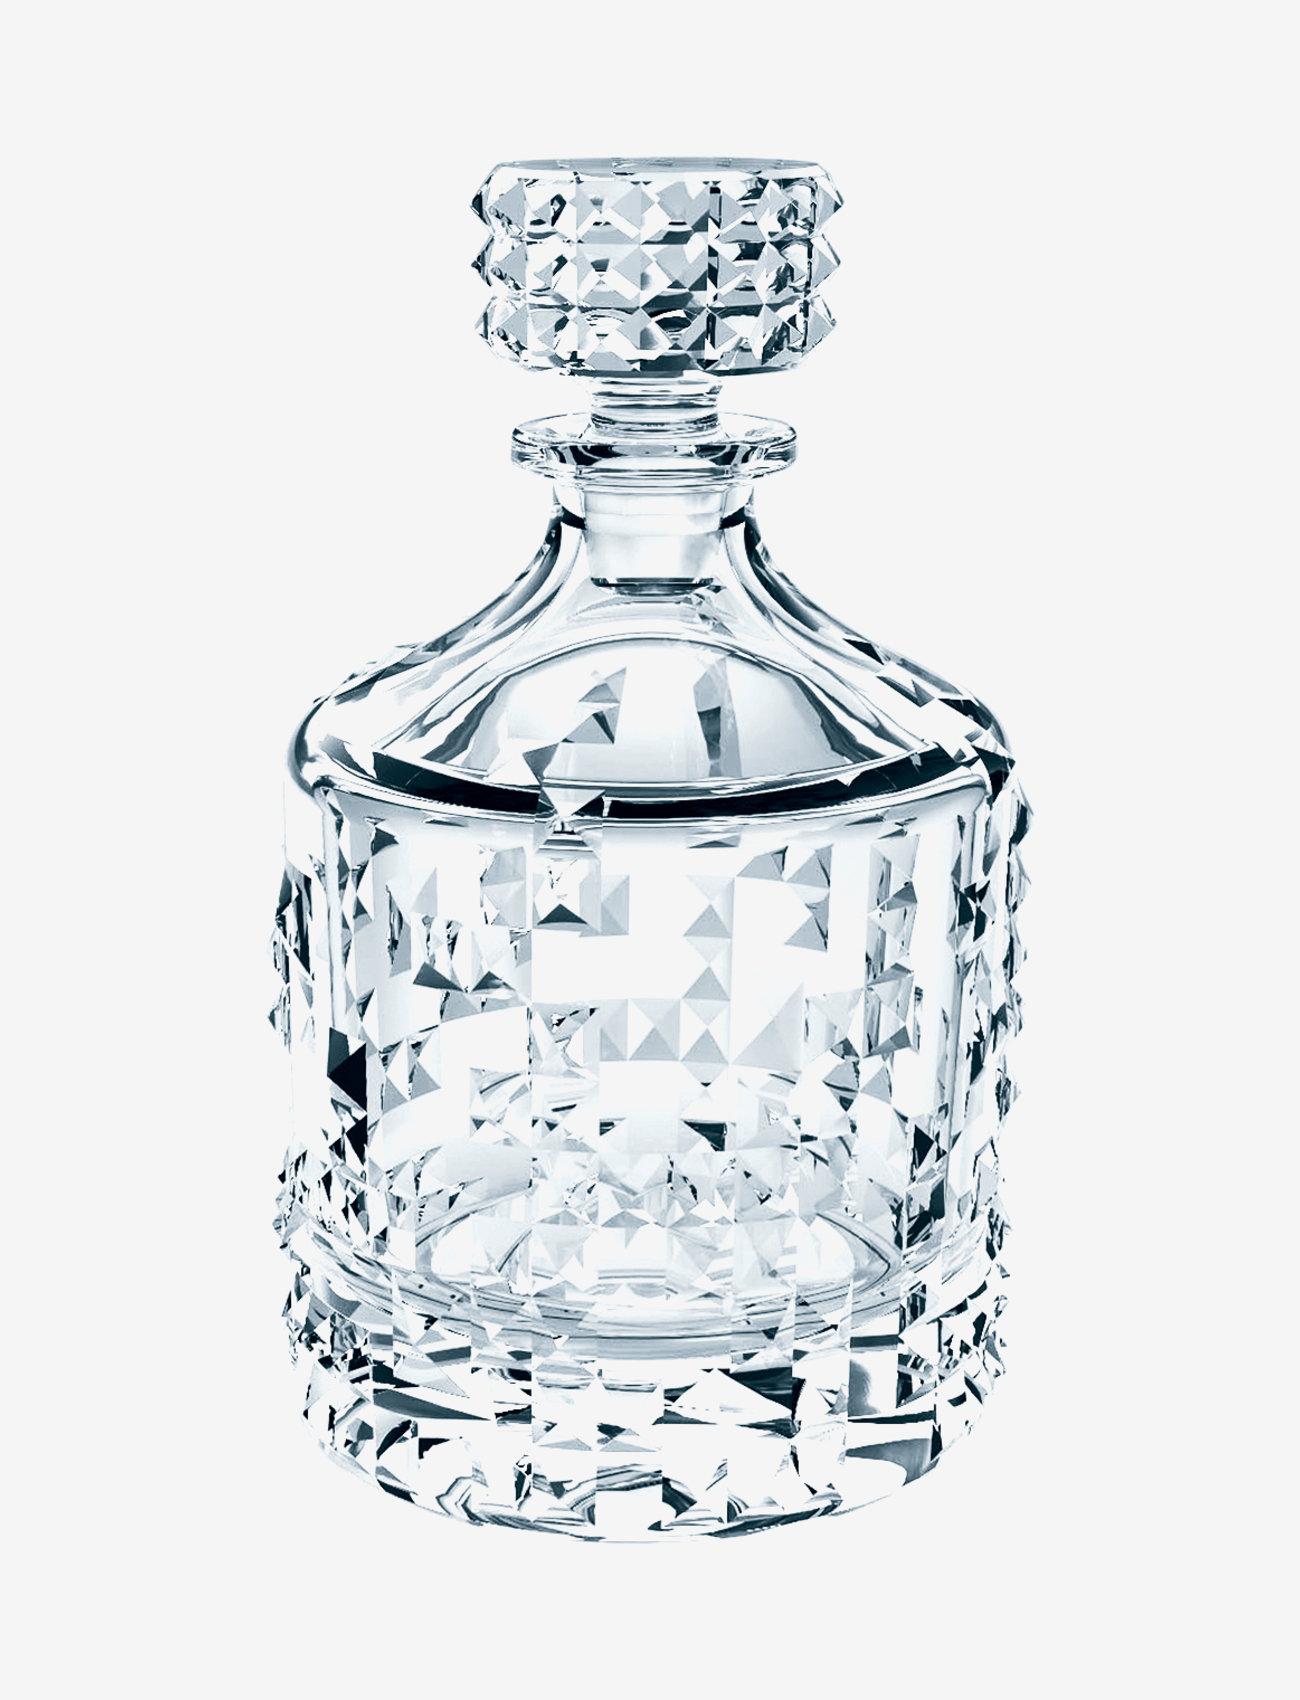 Nachtmann - Punk karahvi 0,75L - viinikarahvit - clear glass - 0